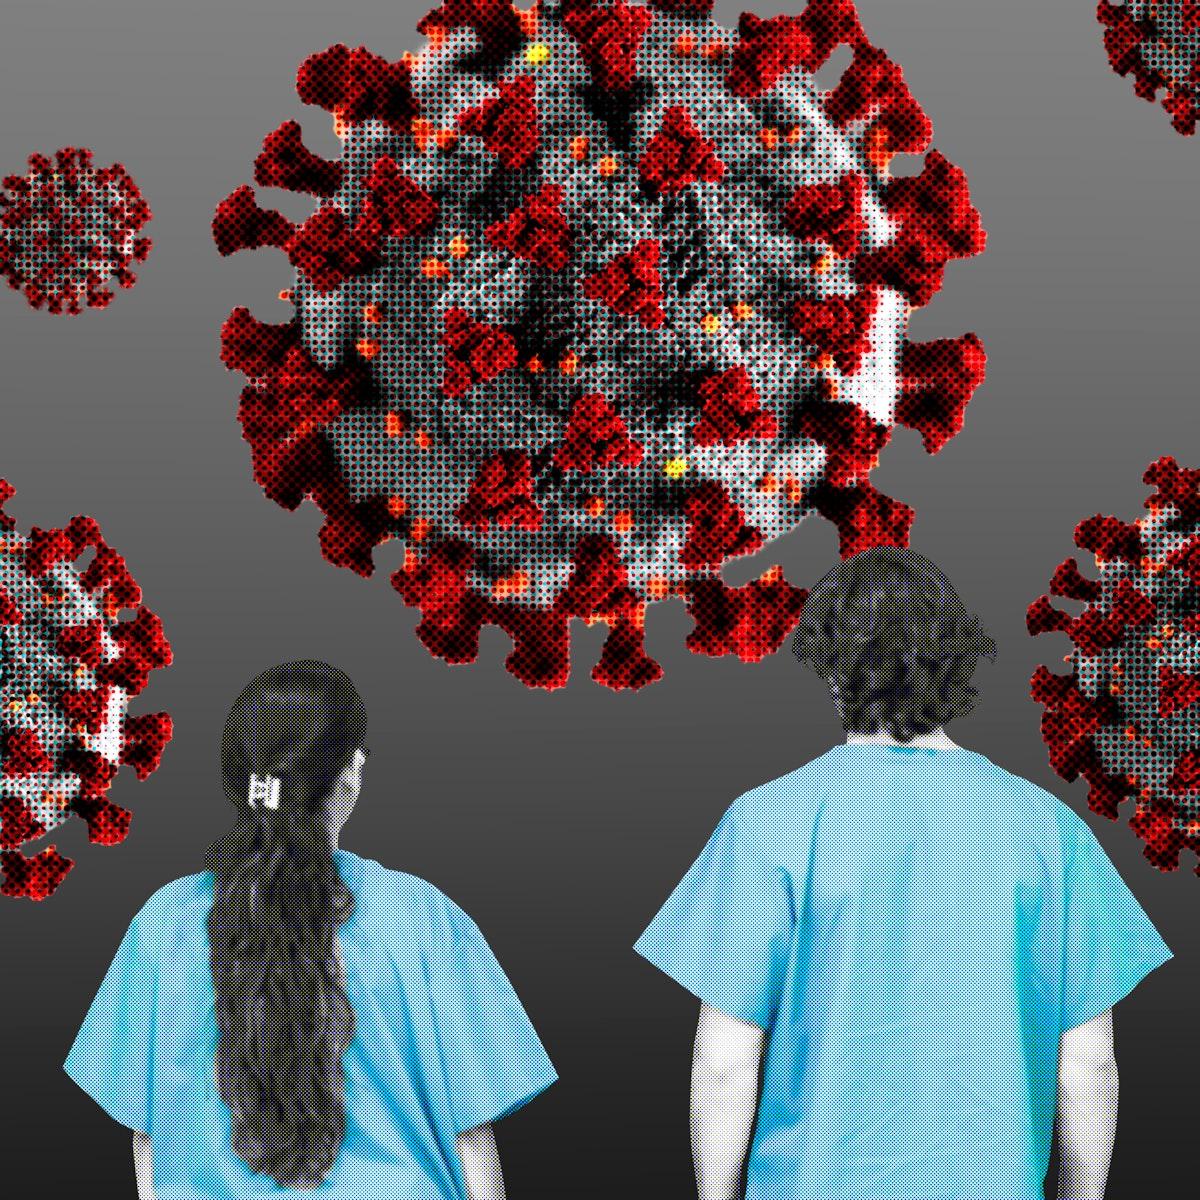 Medical staff against coronavirus pandemic